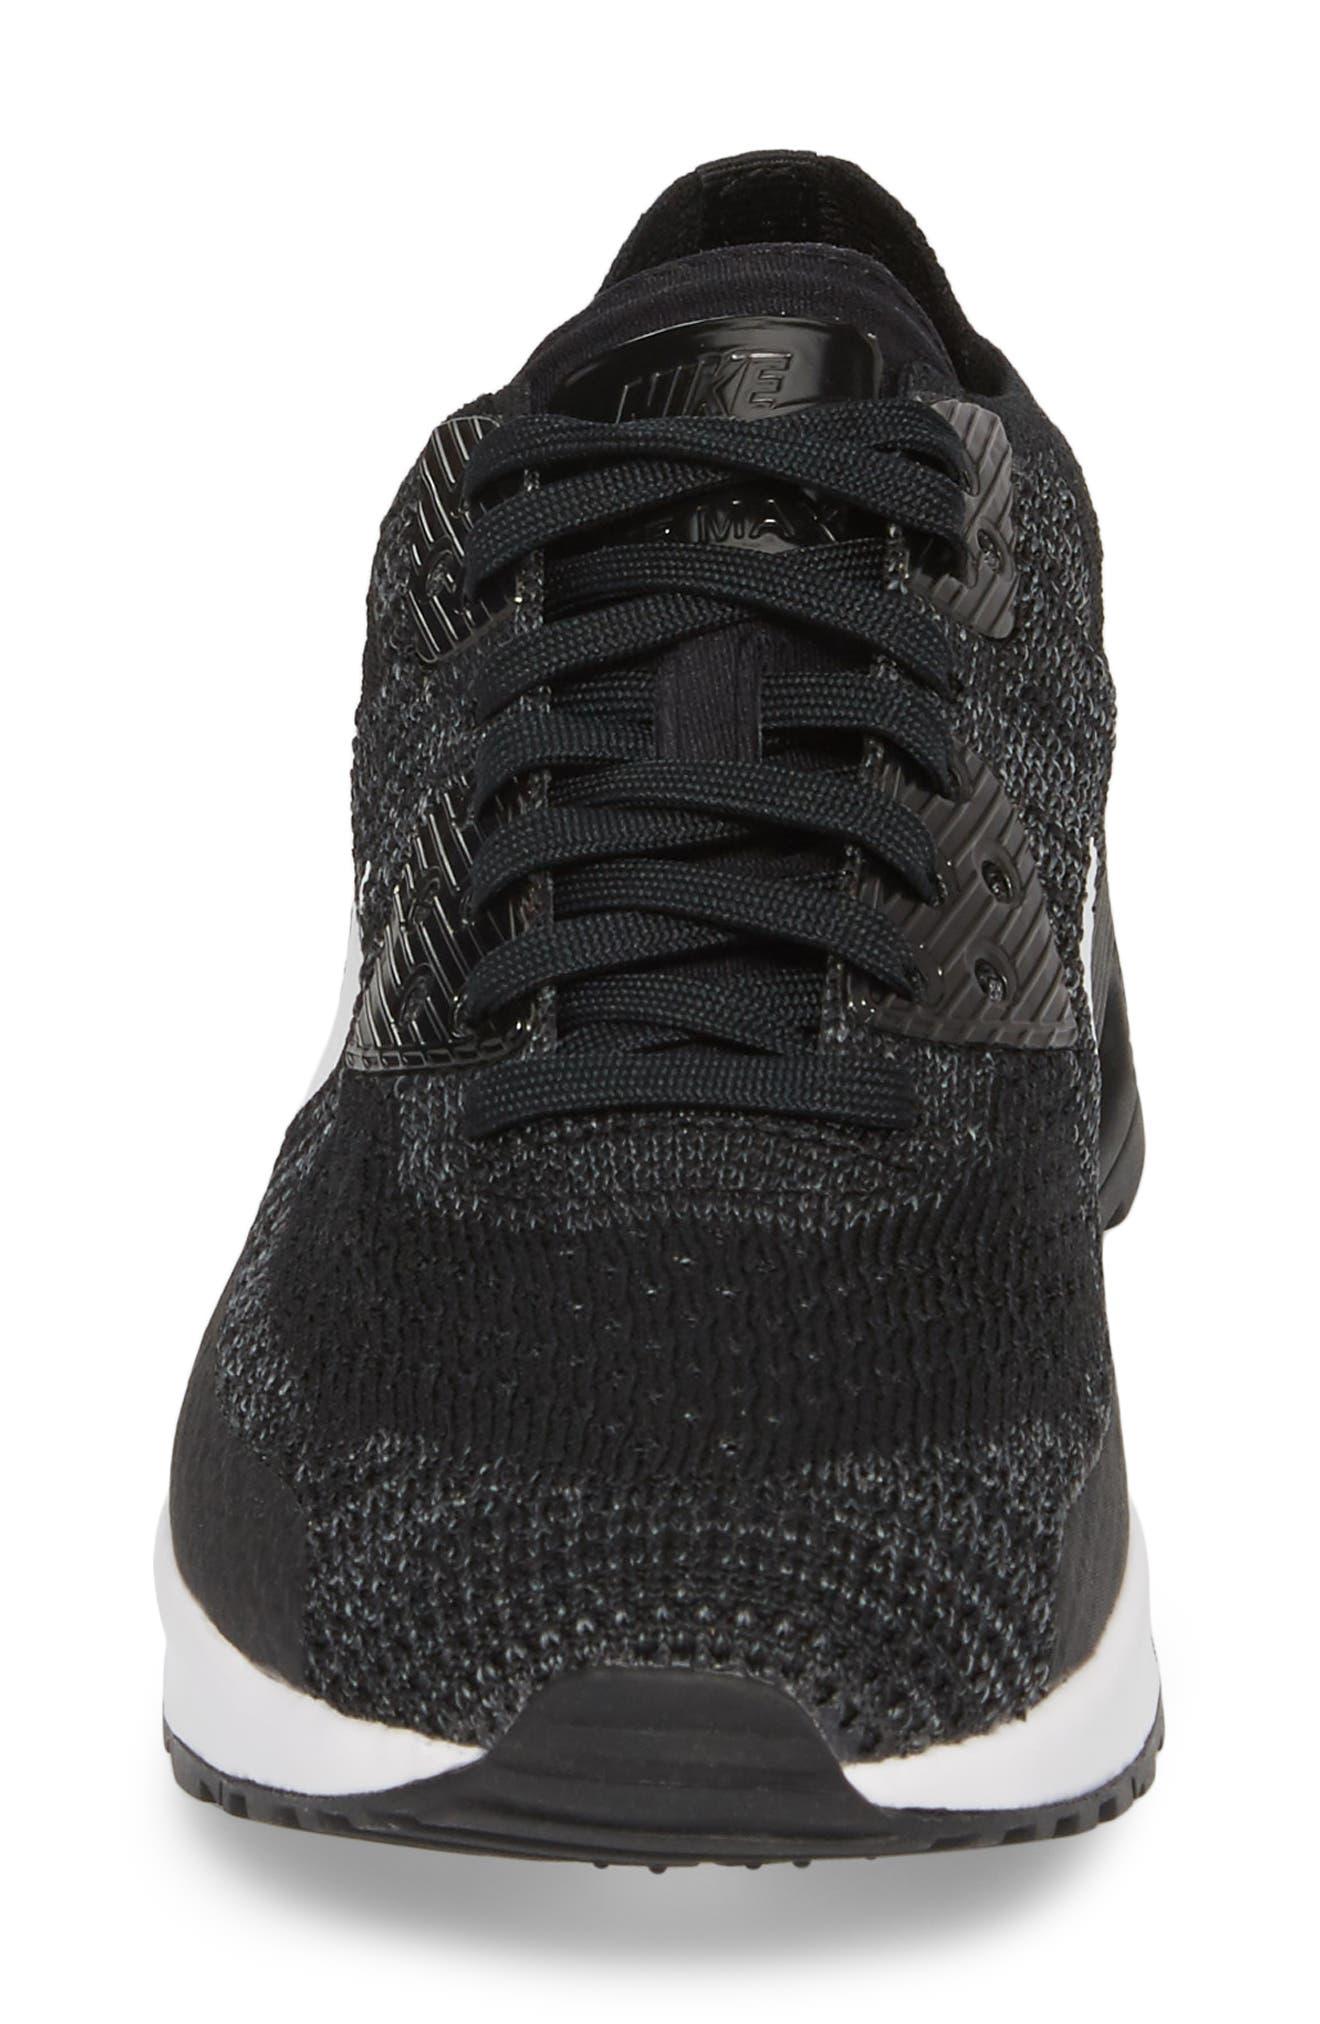 Air Max 90 Flyknit Ultra 2.0 Sneaker,                             Alternate thumbnail 4, color,                             Black/ White/ Dark Grey